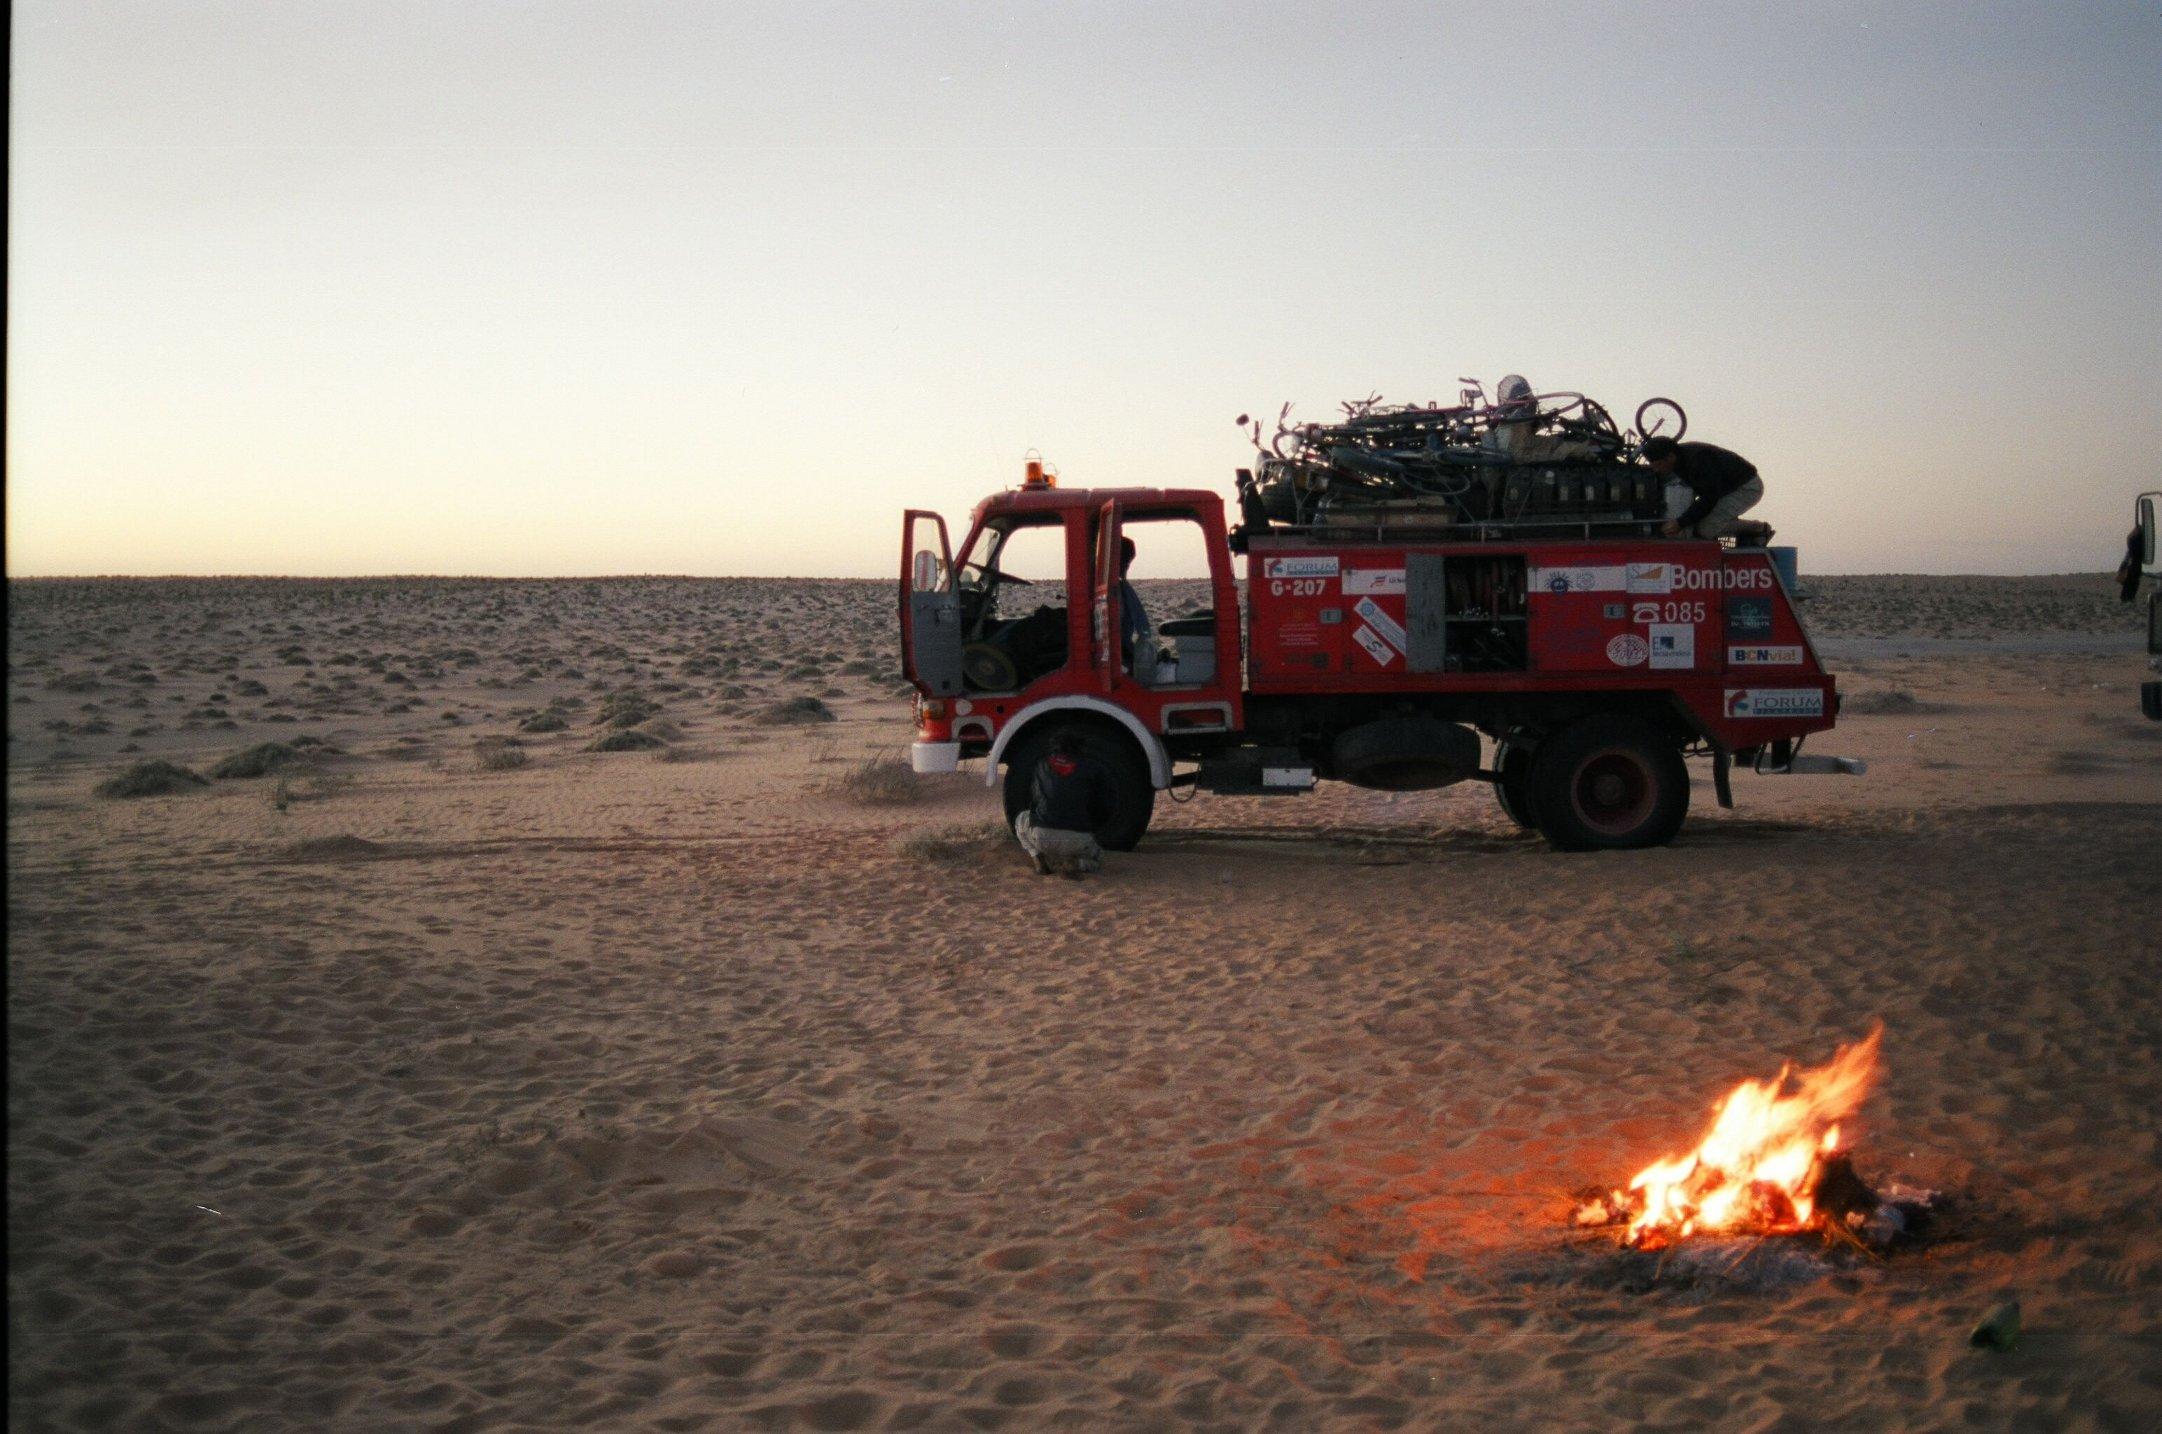 En trànsit al Sàhara